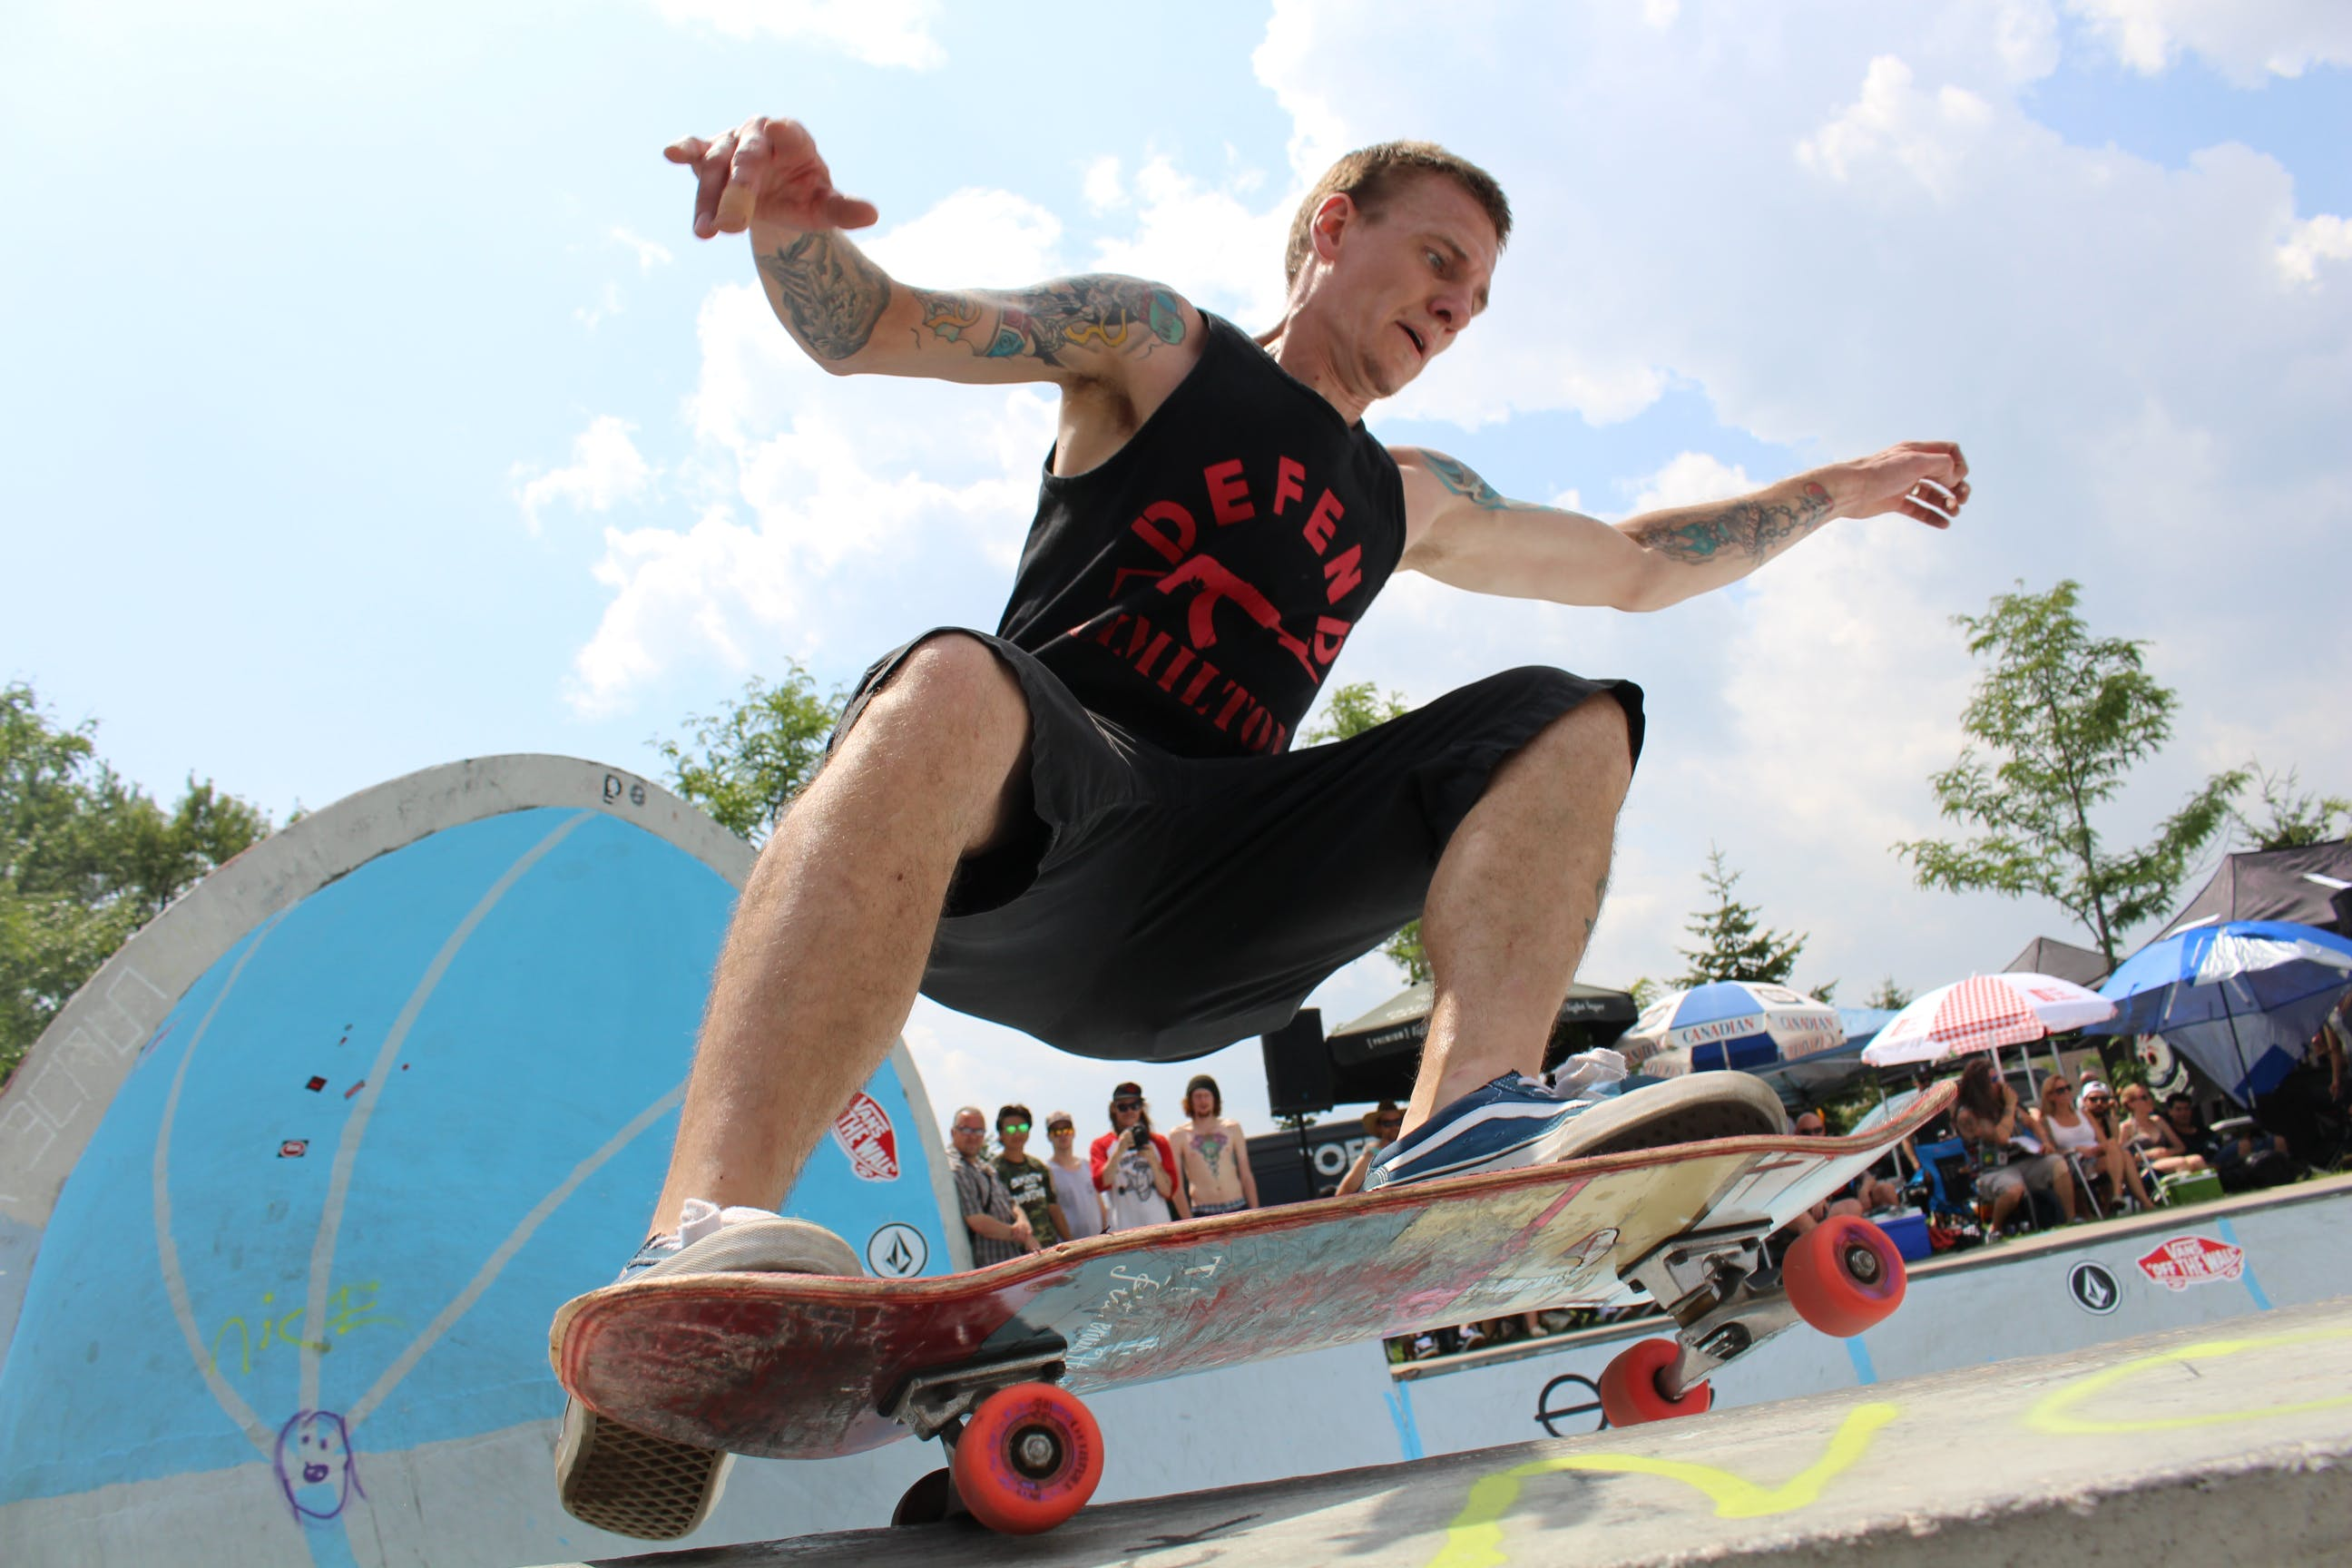 Foto stok gratis jatuh, olahraga, orang, pemain skateboard